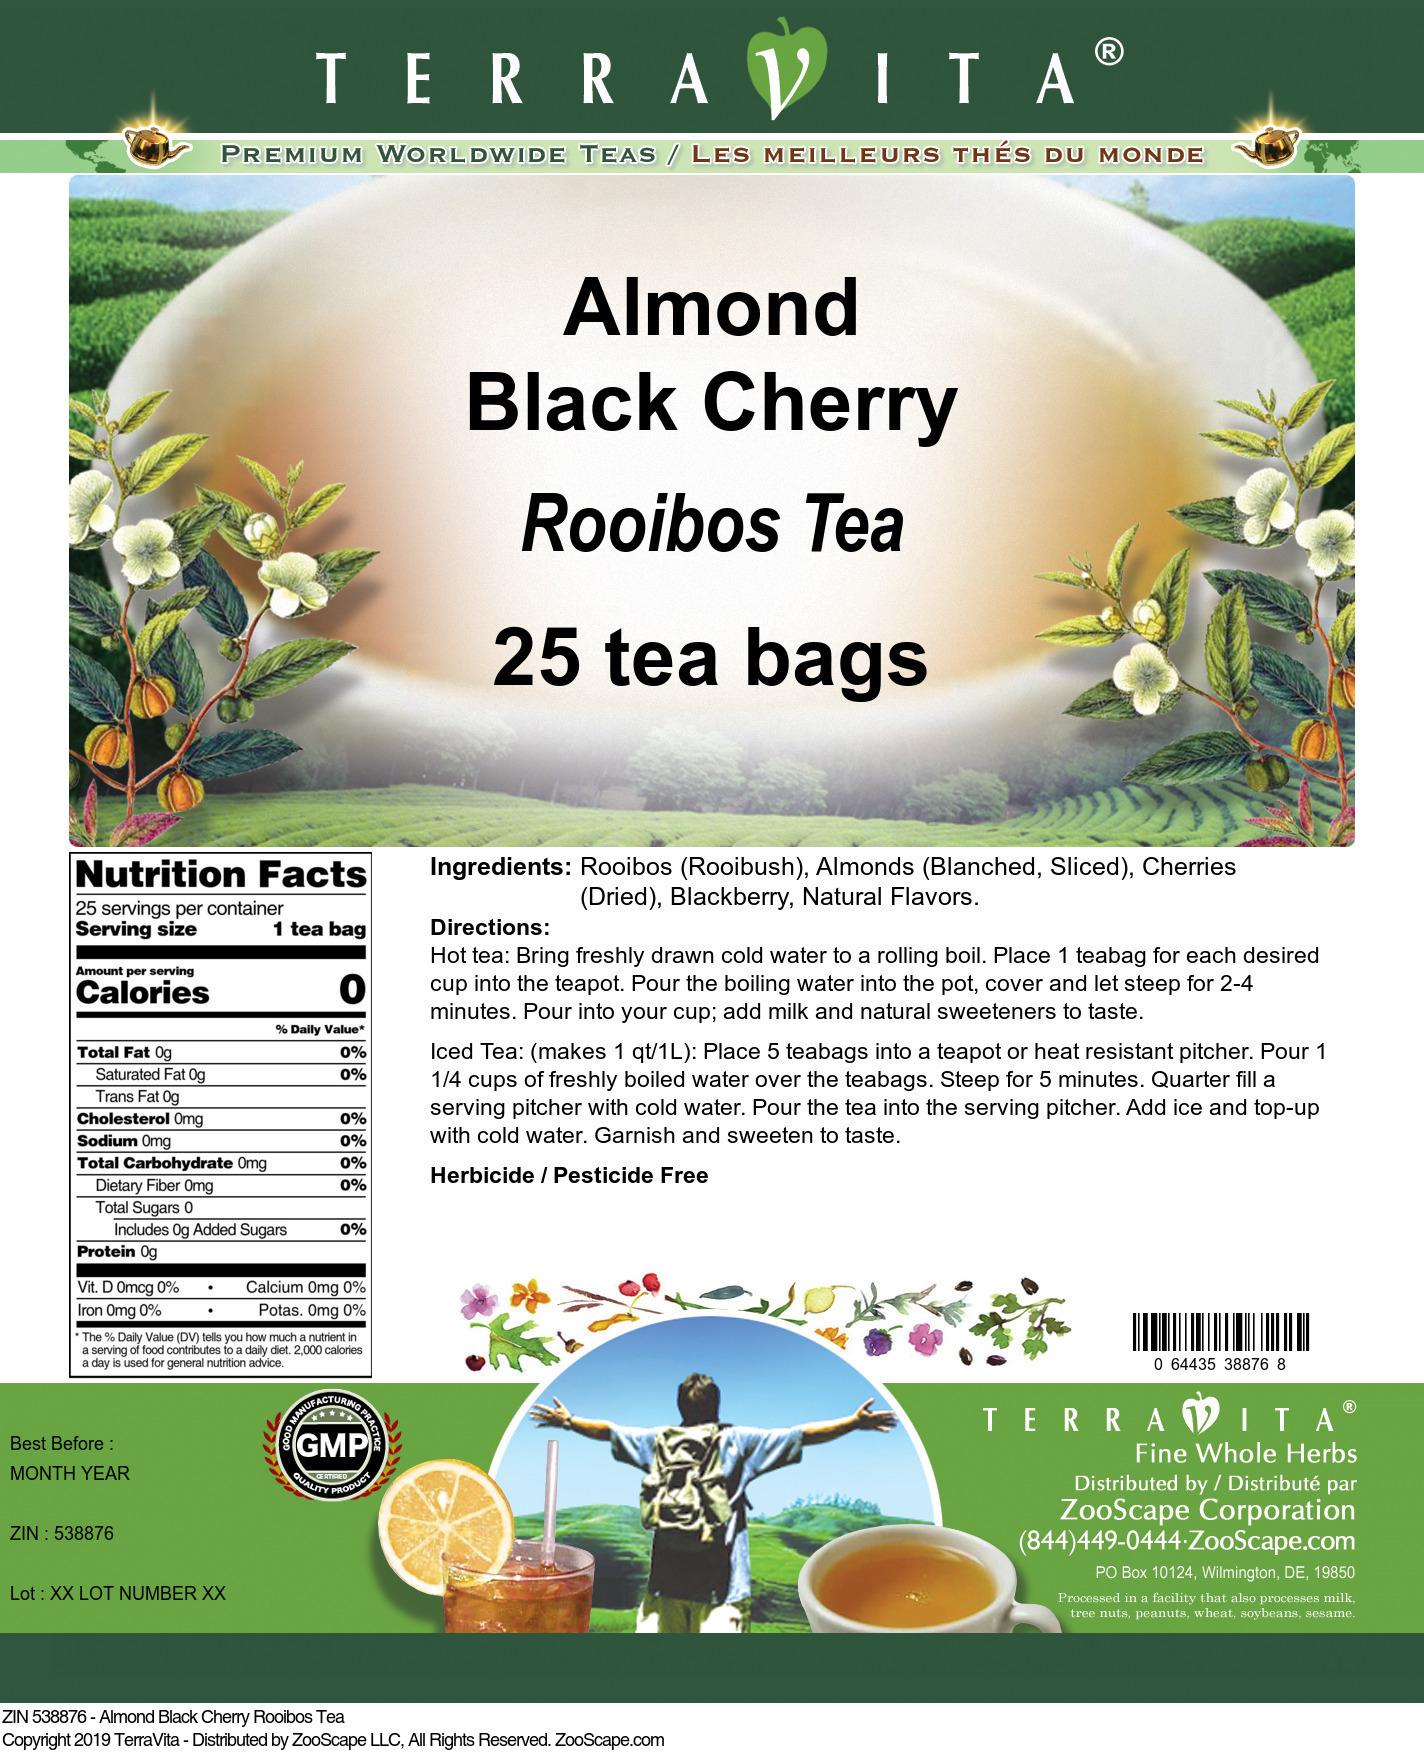 Almond Black Cherry Rooibos Tea